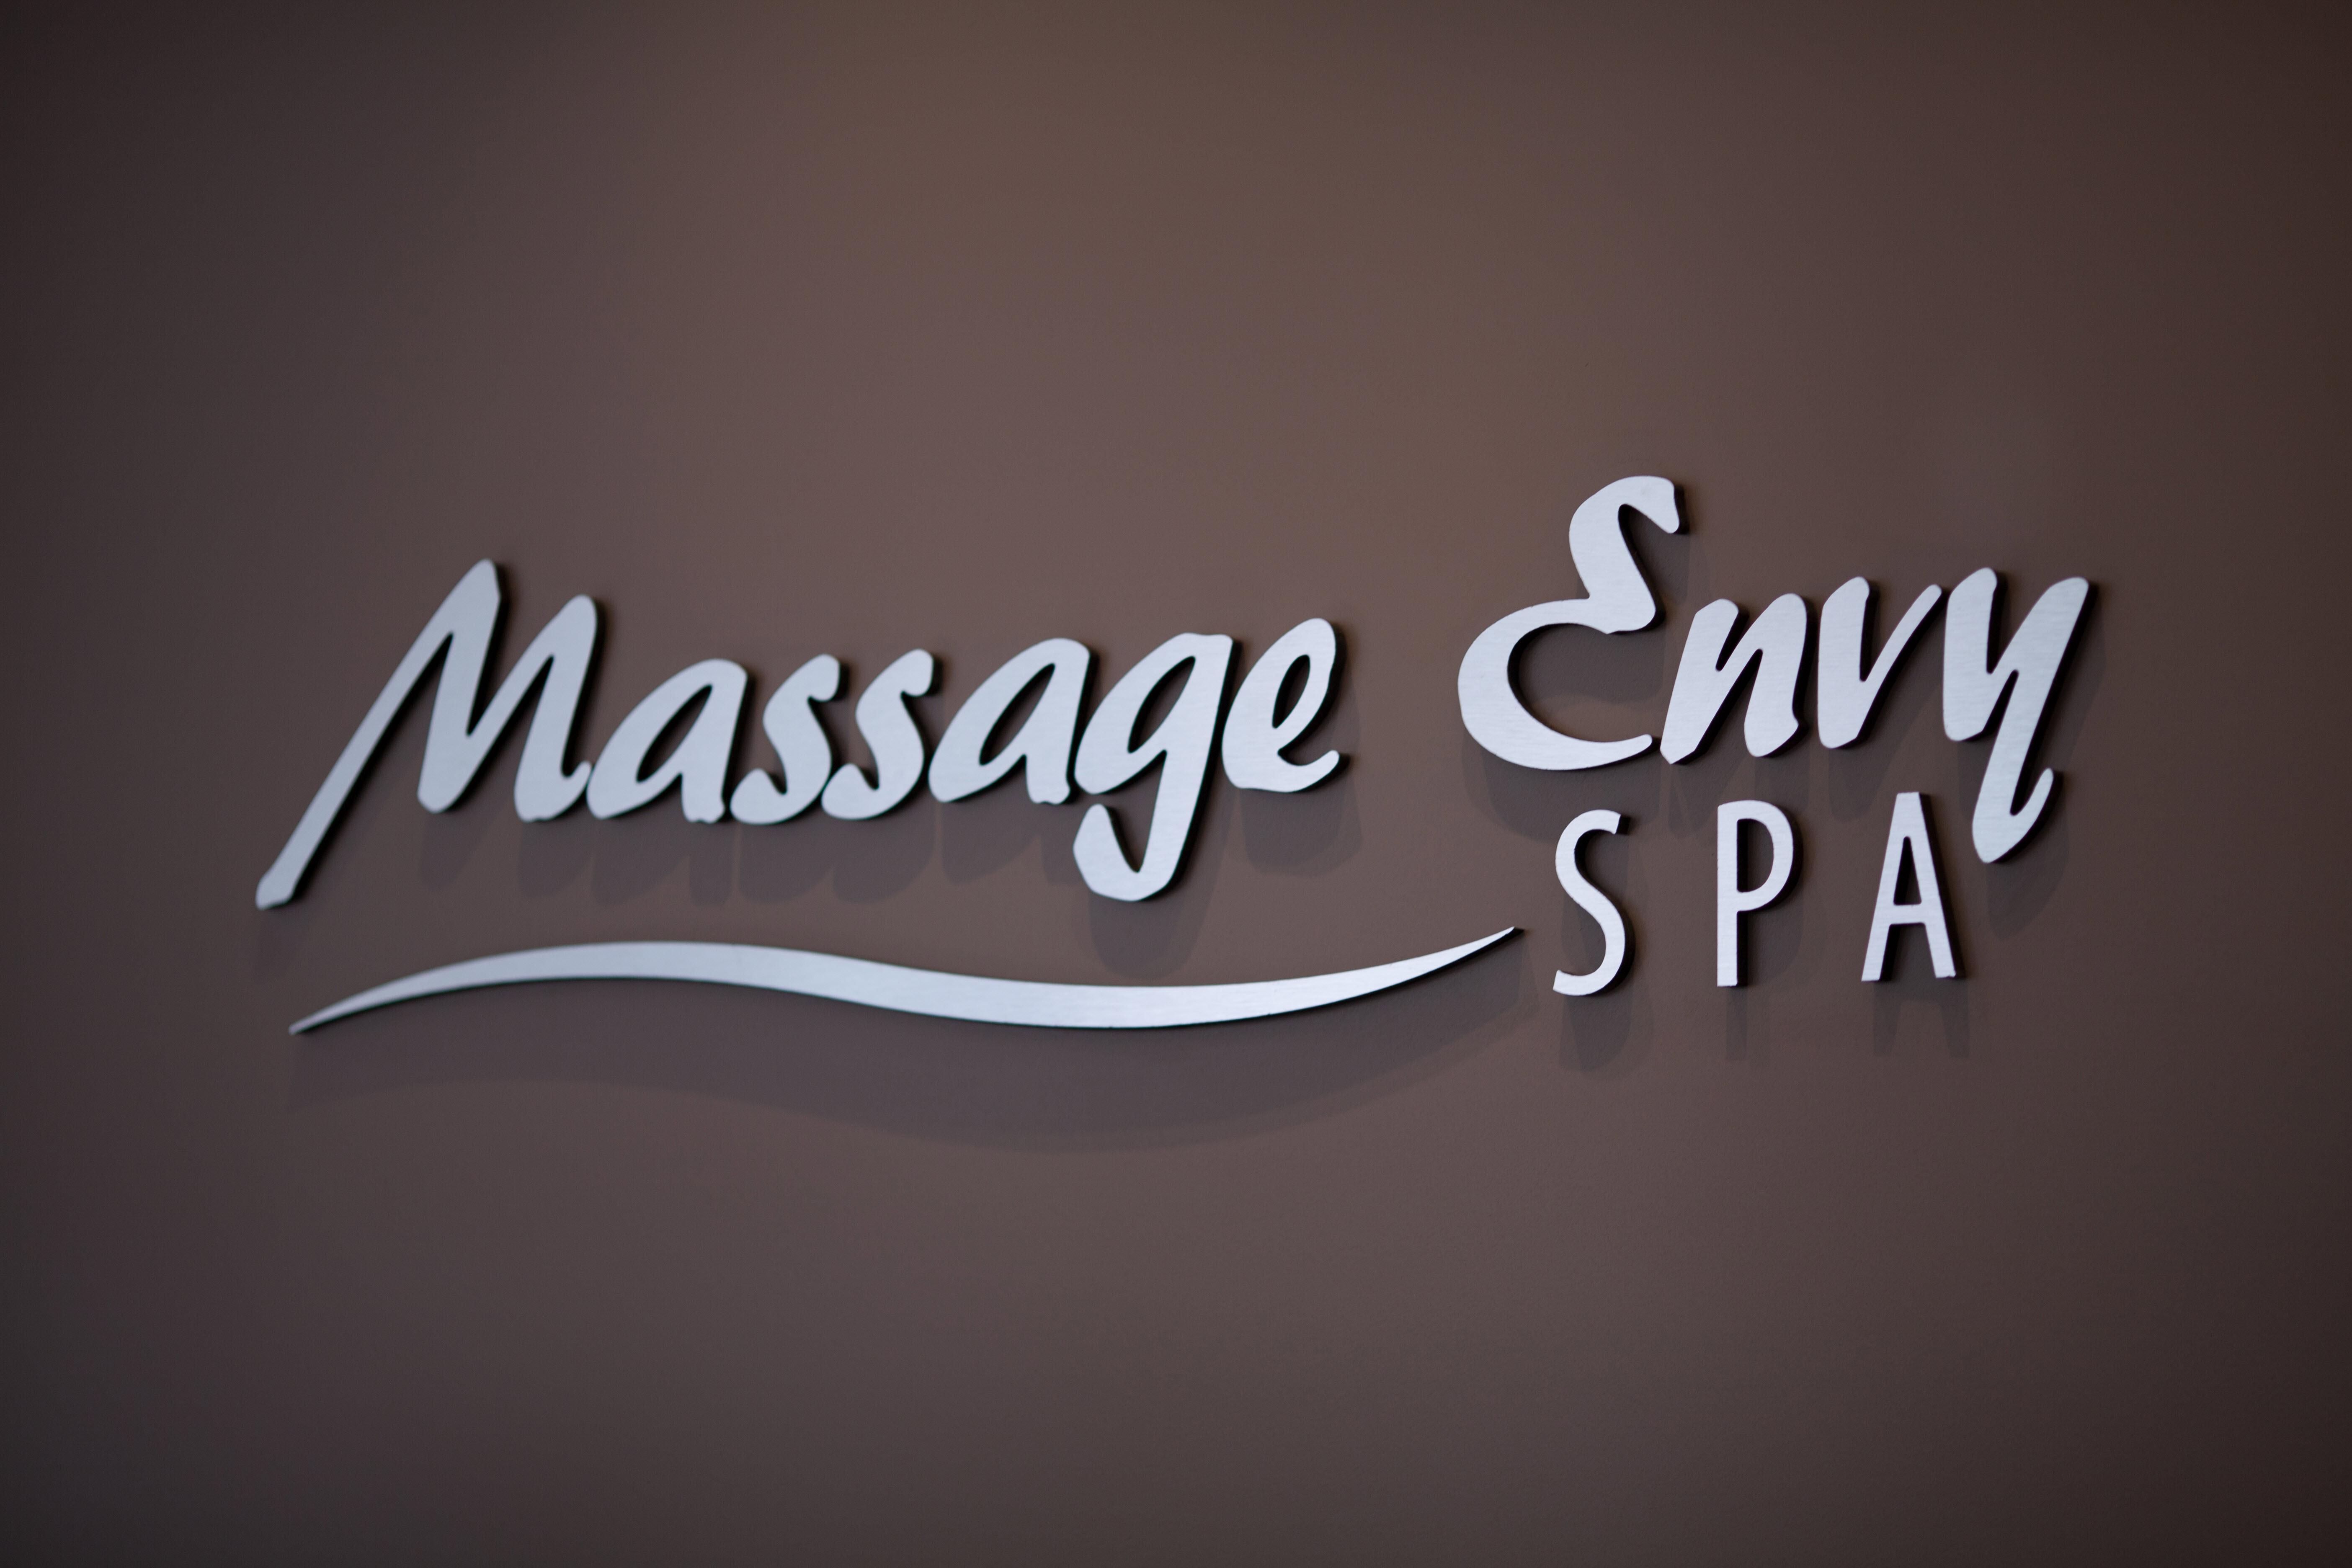 Massage Envy Spa - Cypress - CA